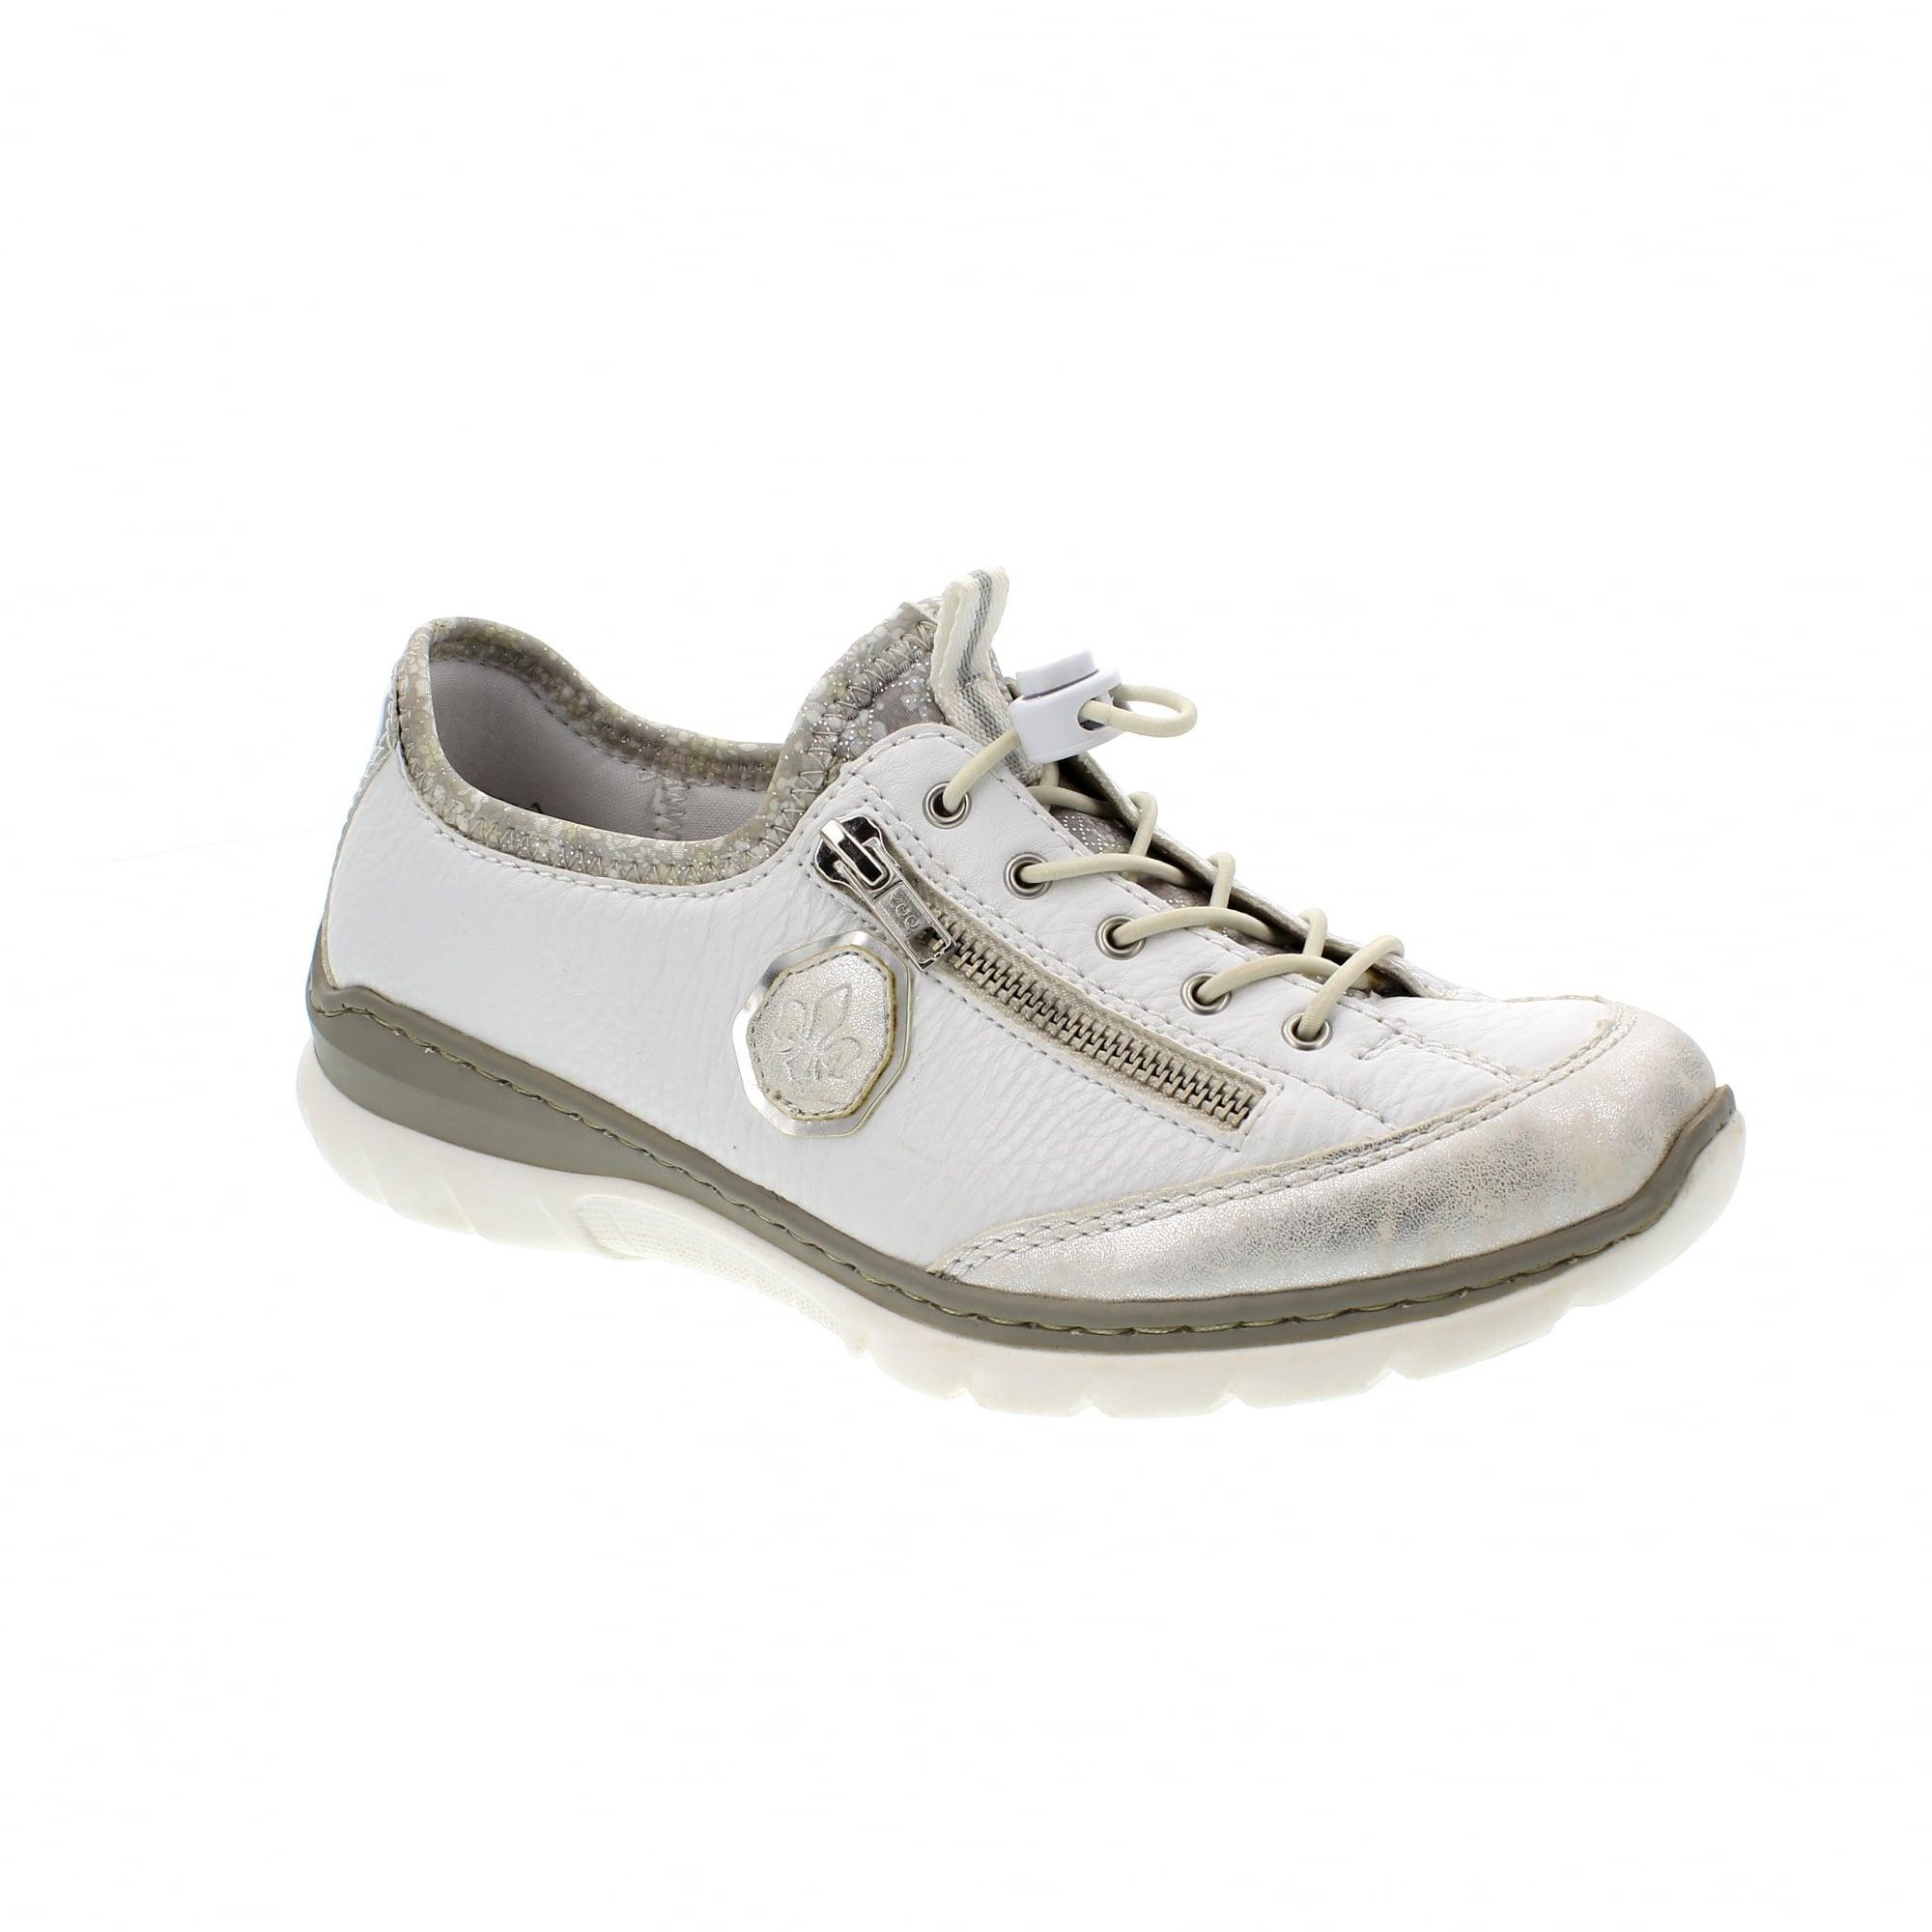 Rieker L3263-80 White/Silver Womens